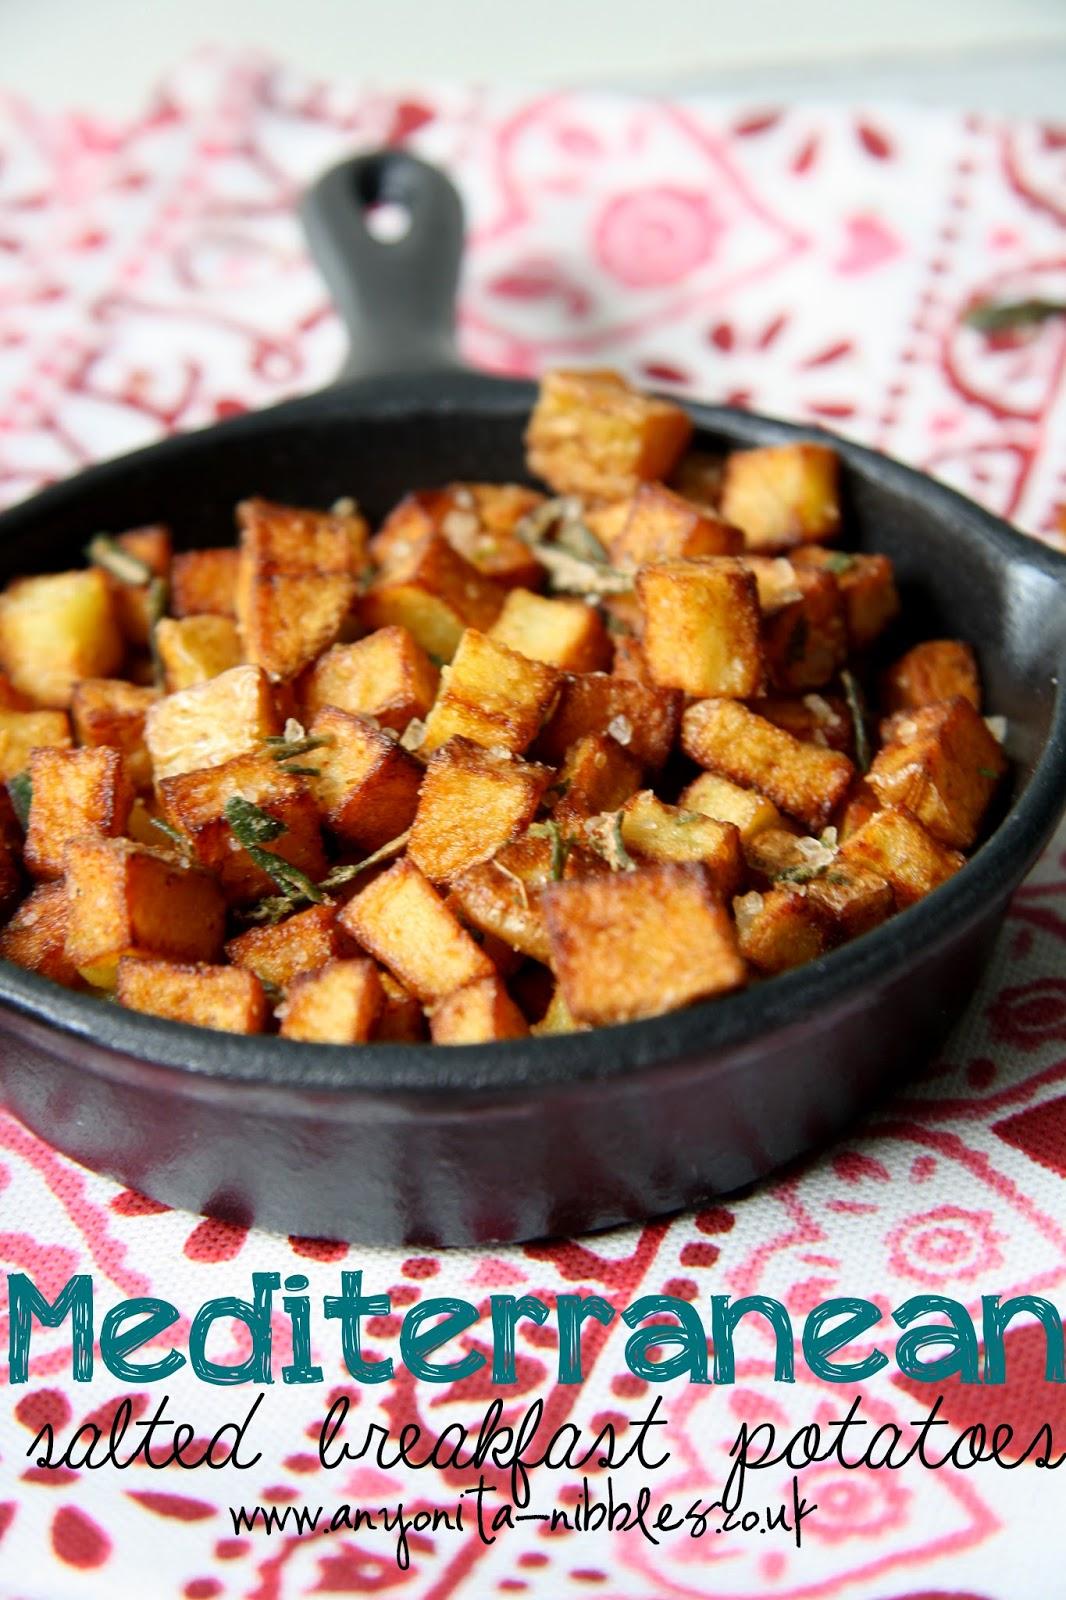 Pan of #fried diced #potato with rosemary #salt from Anyonita Nibbles #glutenfree #vegetarian #vegan